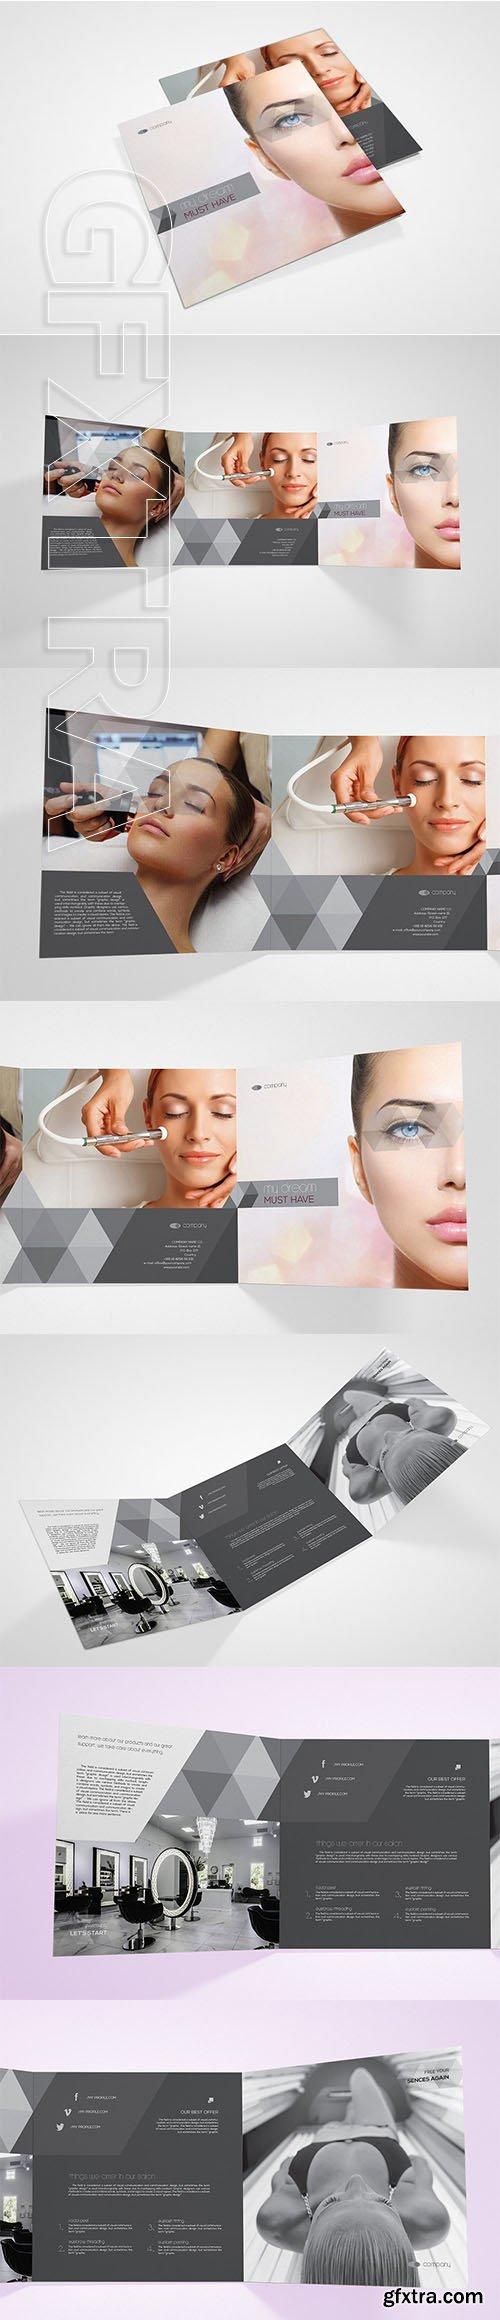 CreativeMarket - Beauty Salon Square Brochure 2798623